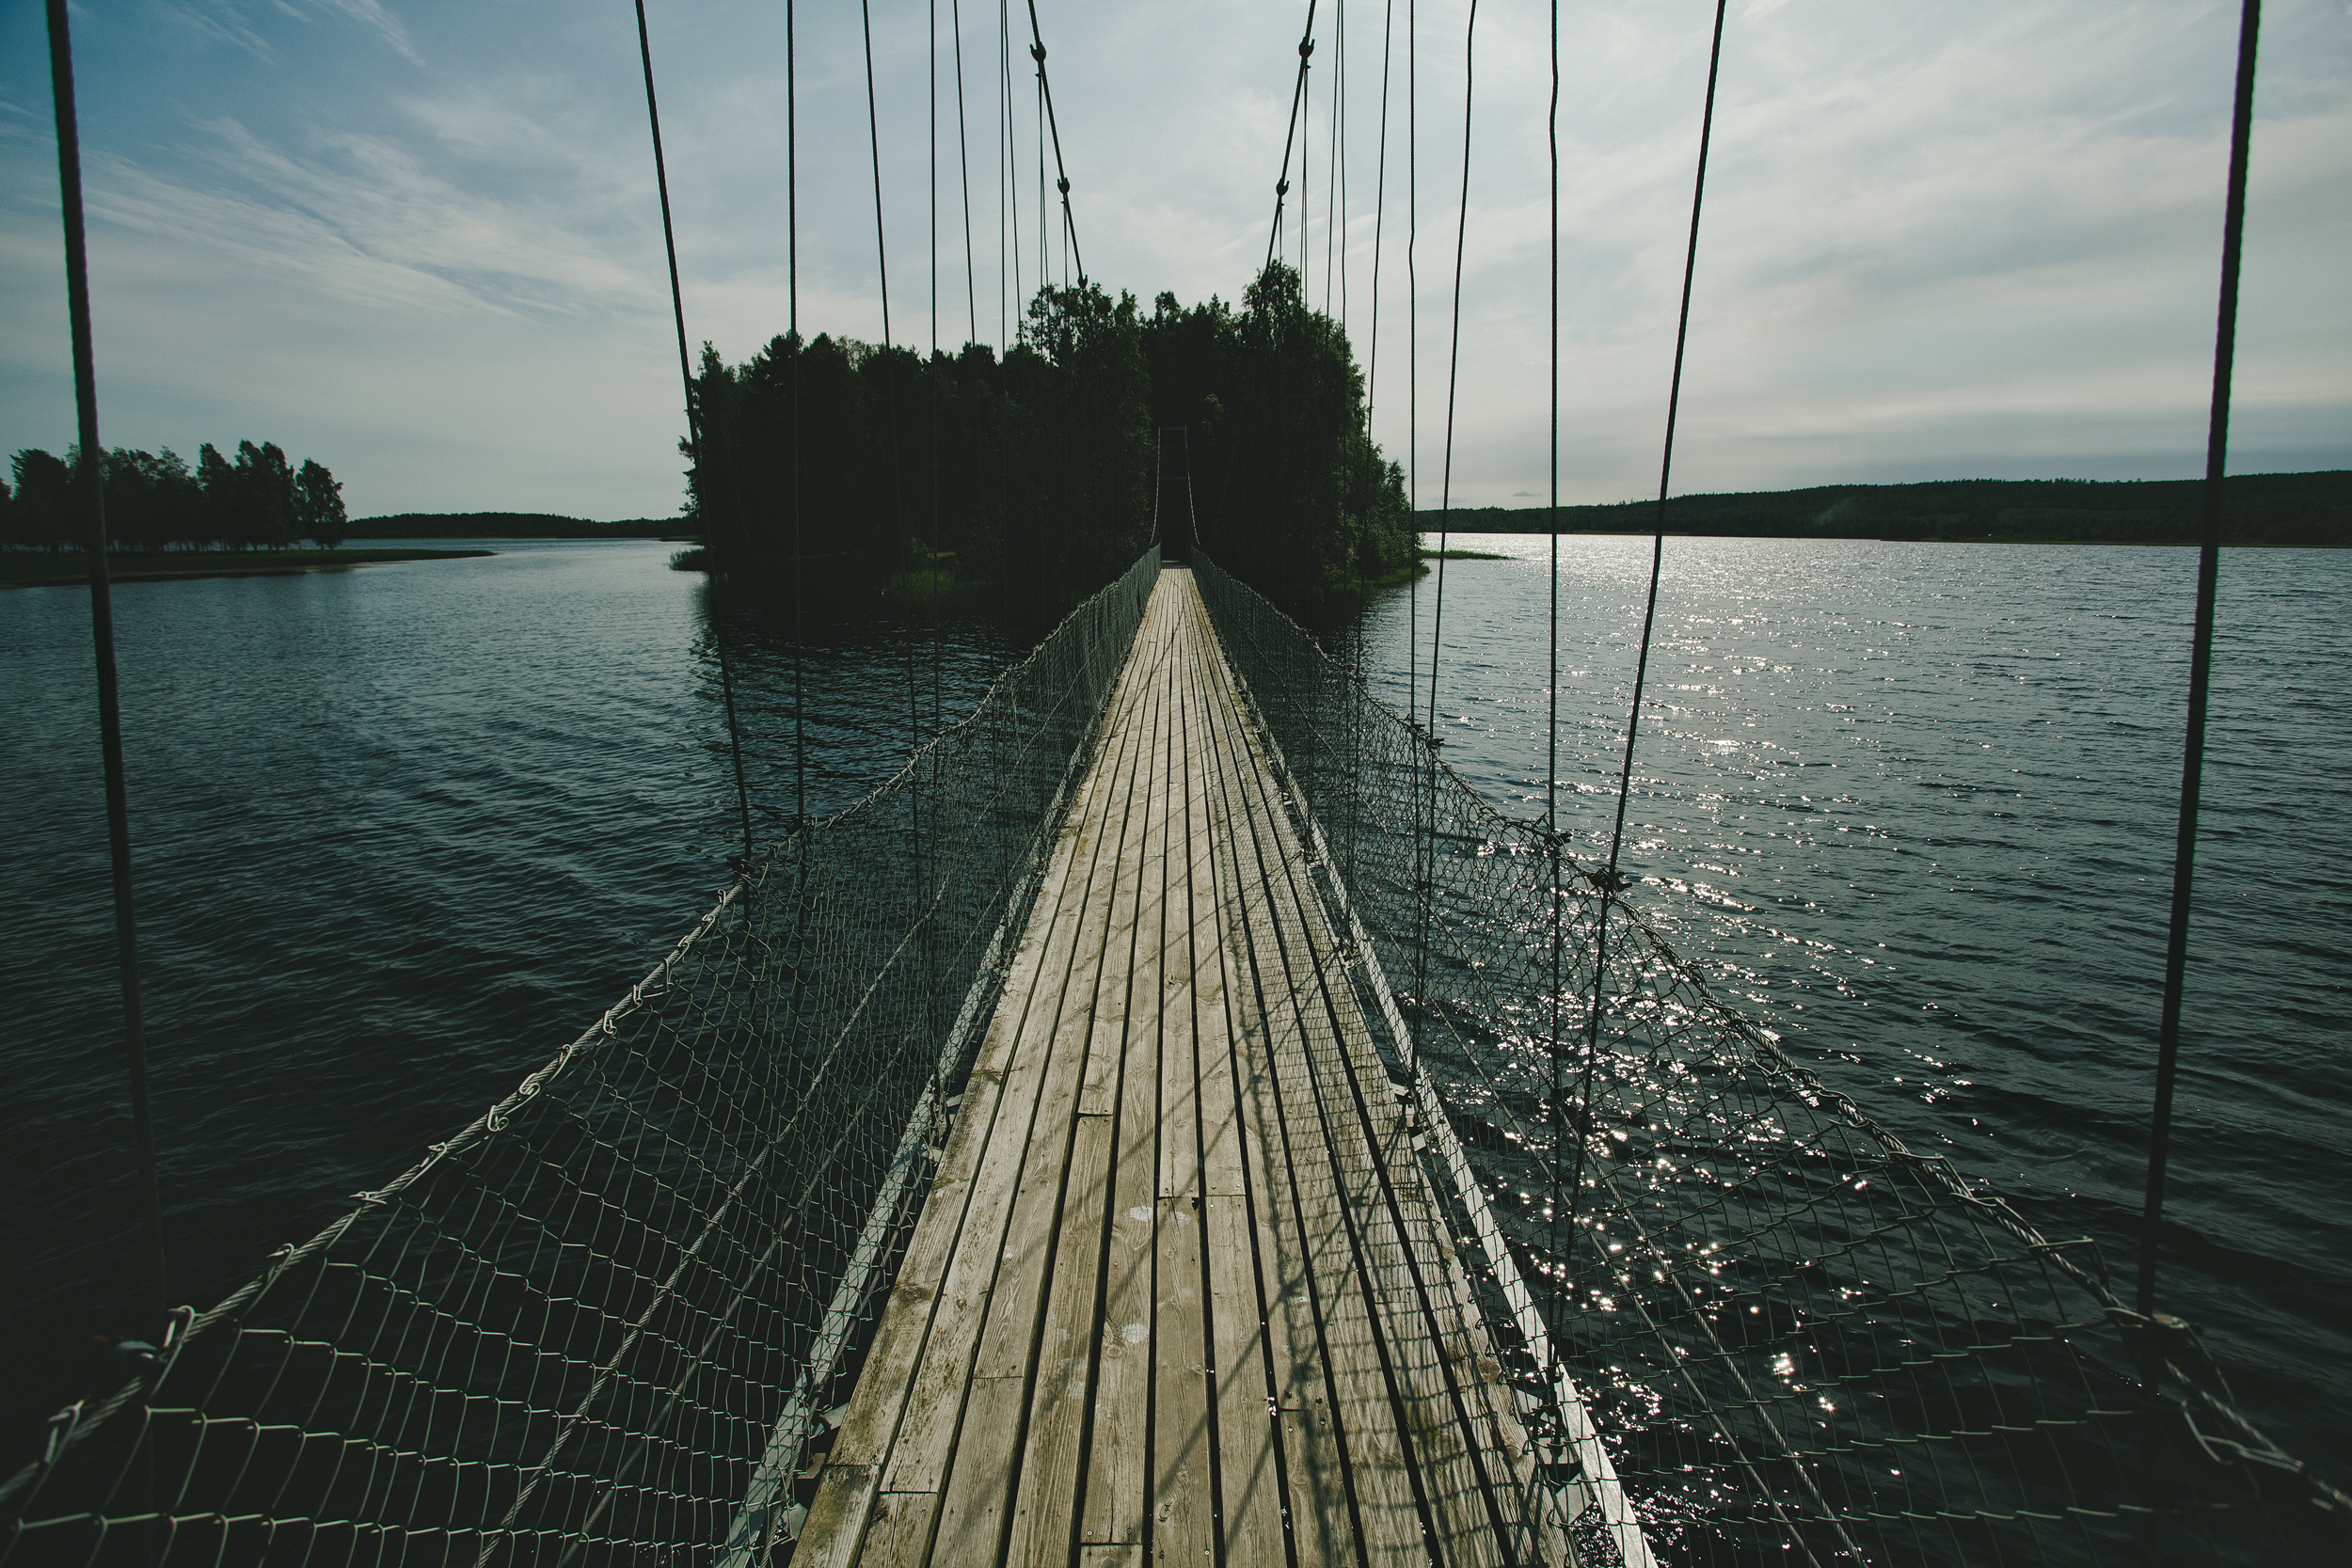 The Bridge to the Island